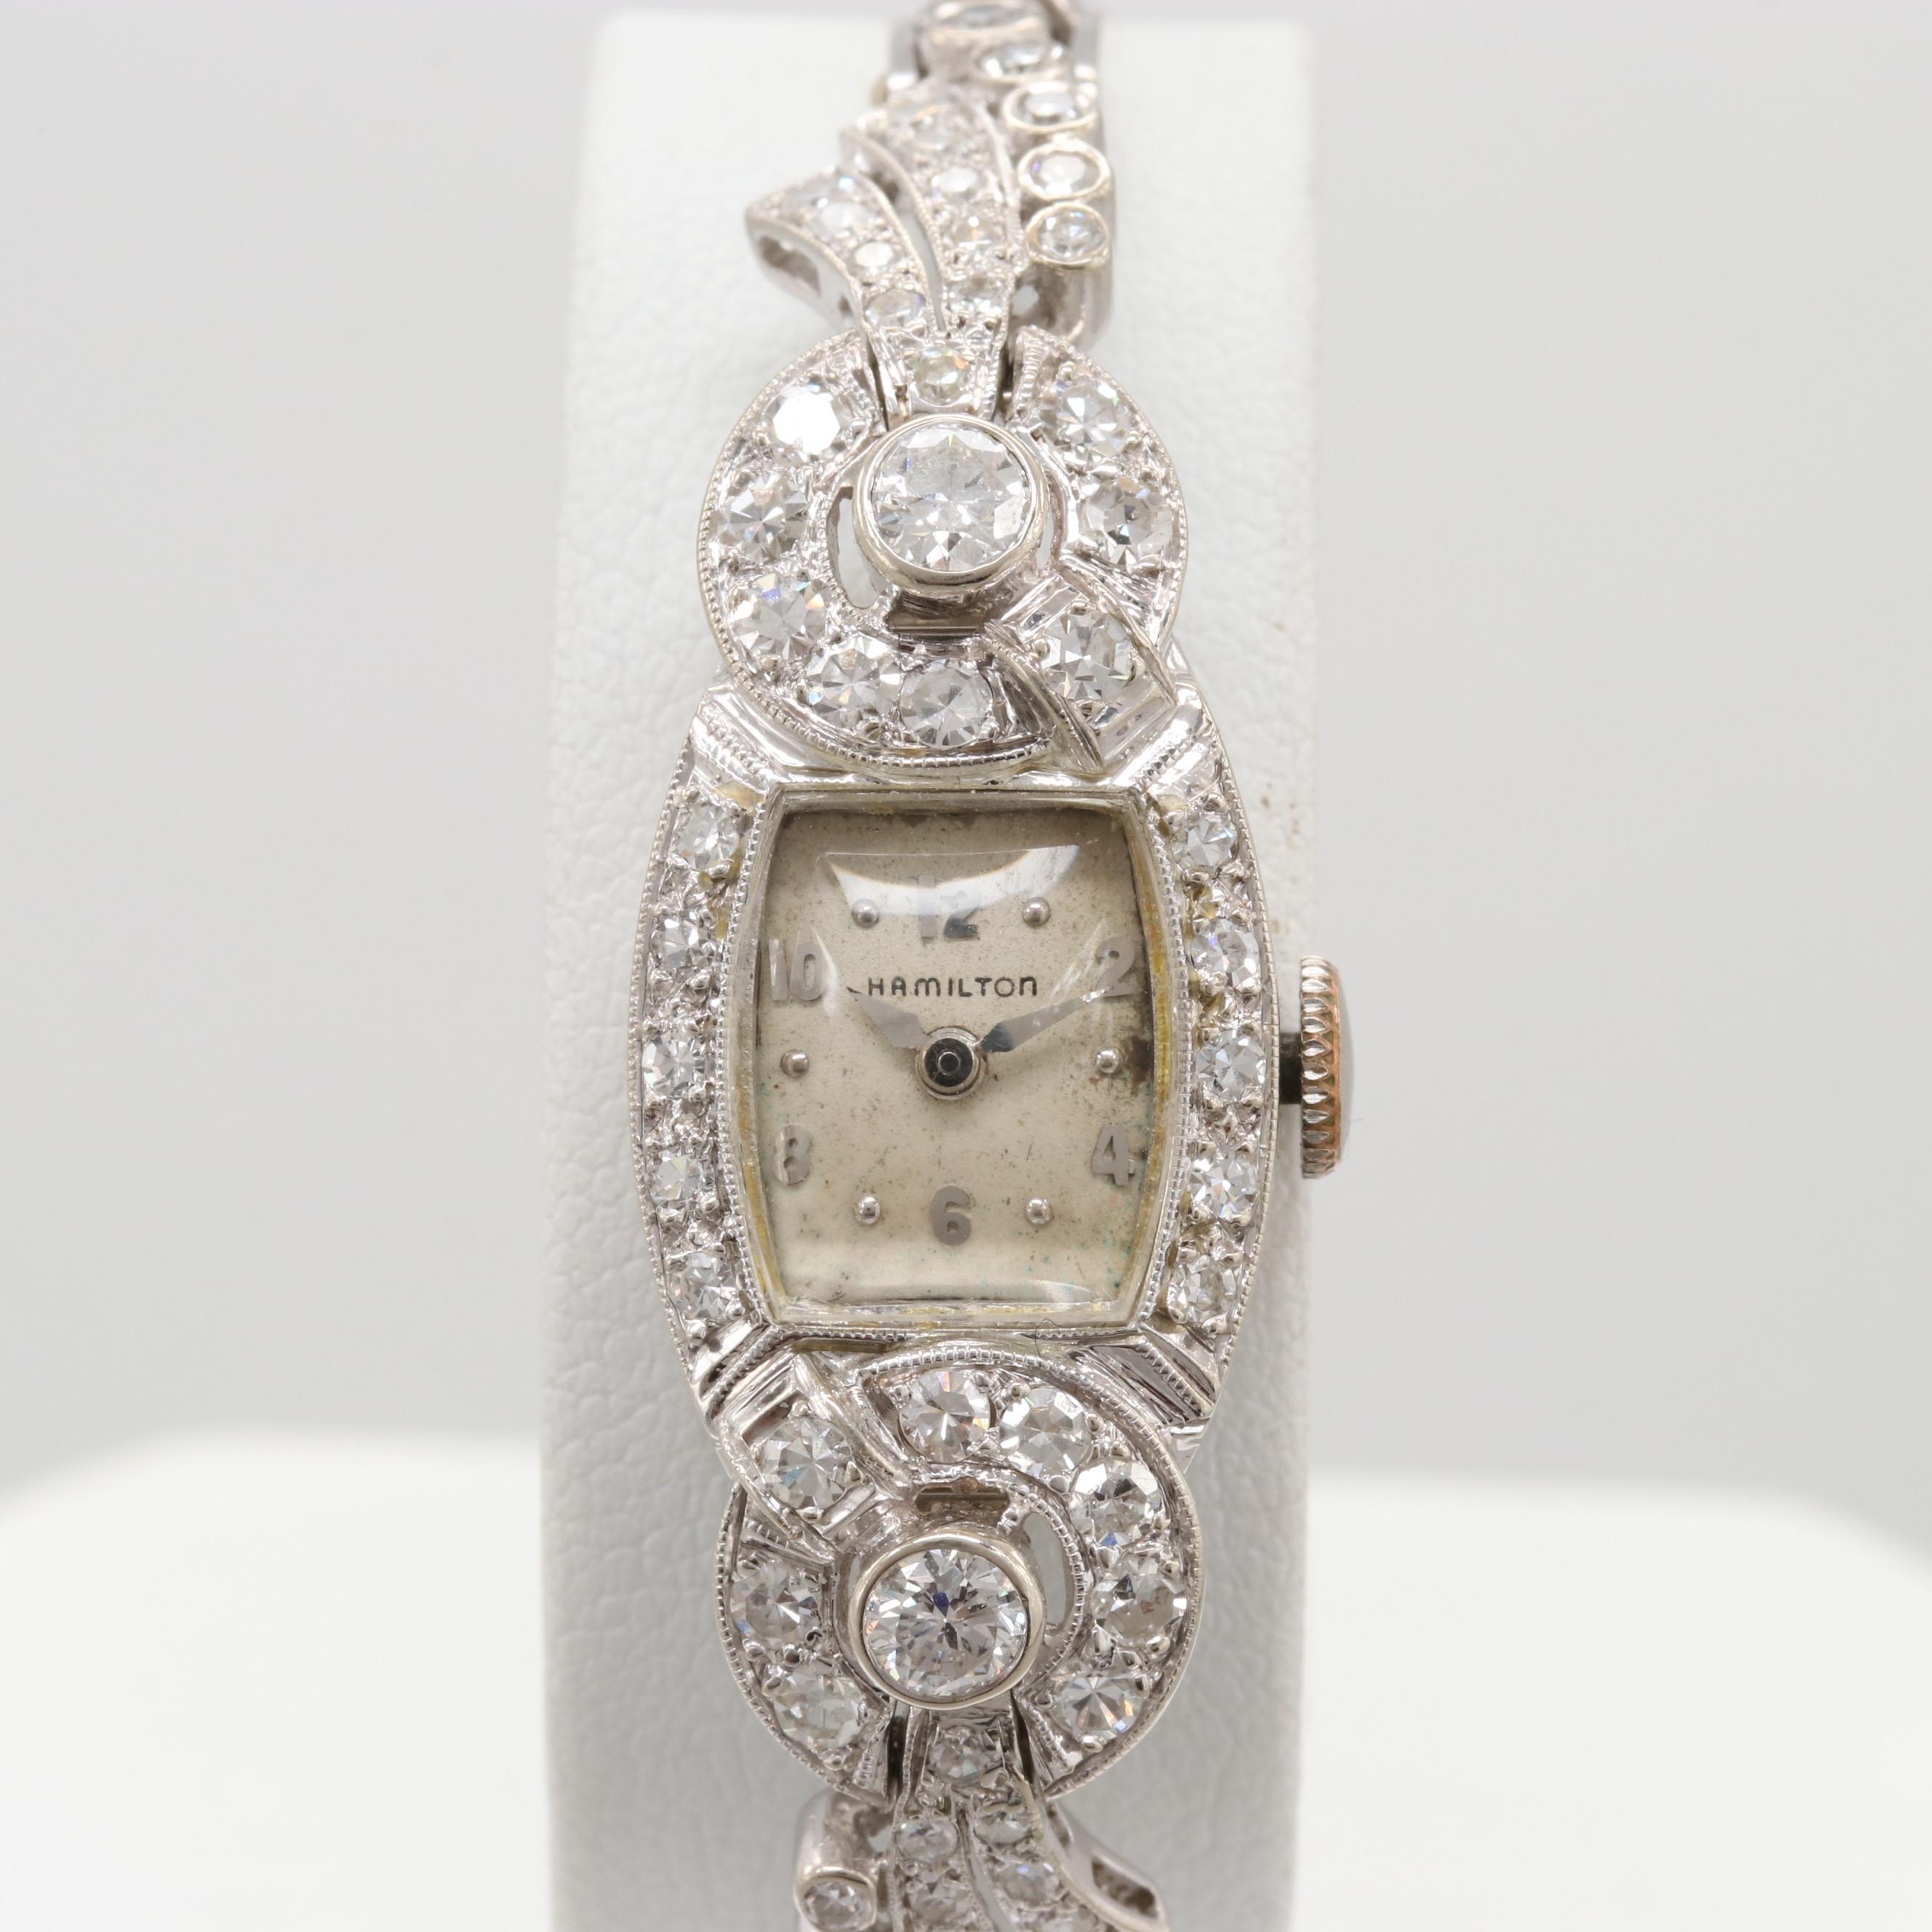 Hamilton 14K White Gold 1.98 CTW Diamond Bezel and Bracelet Wristwatch